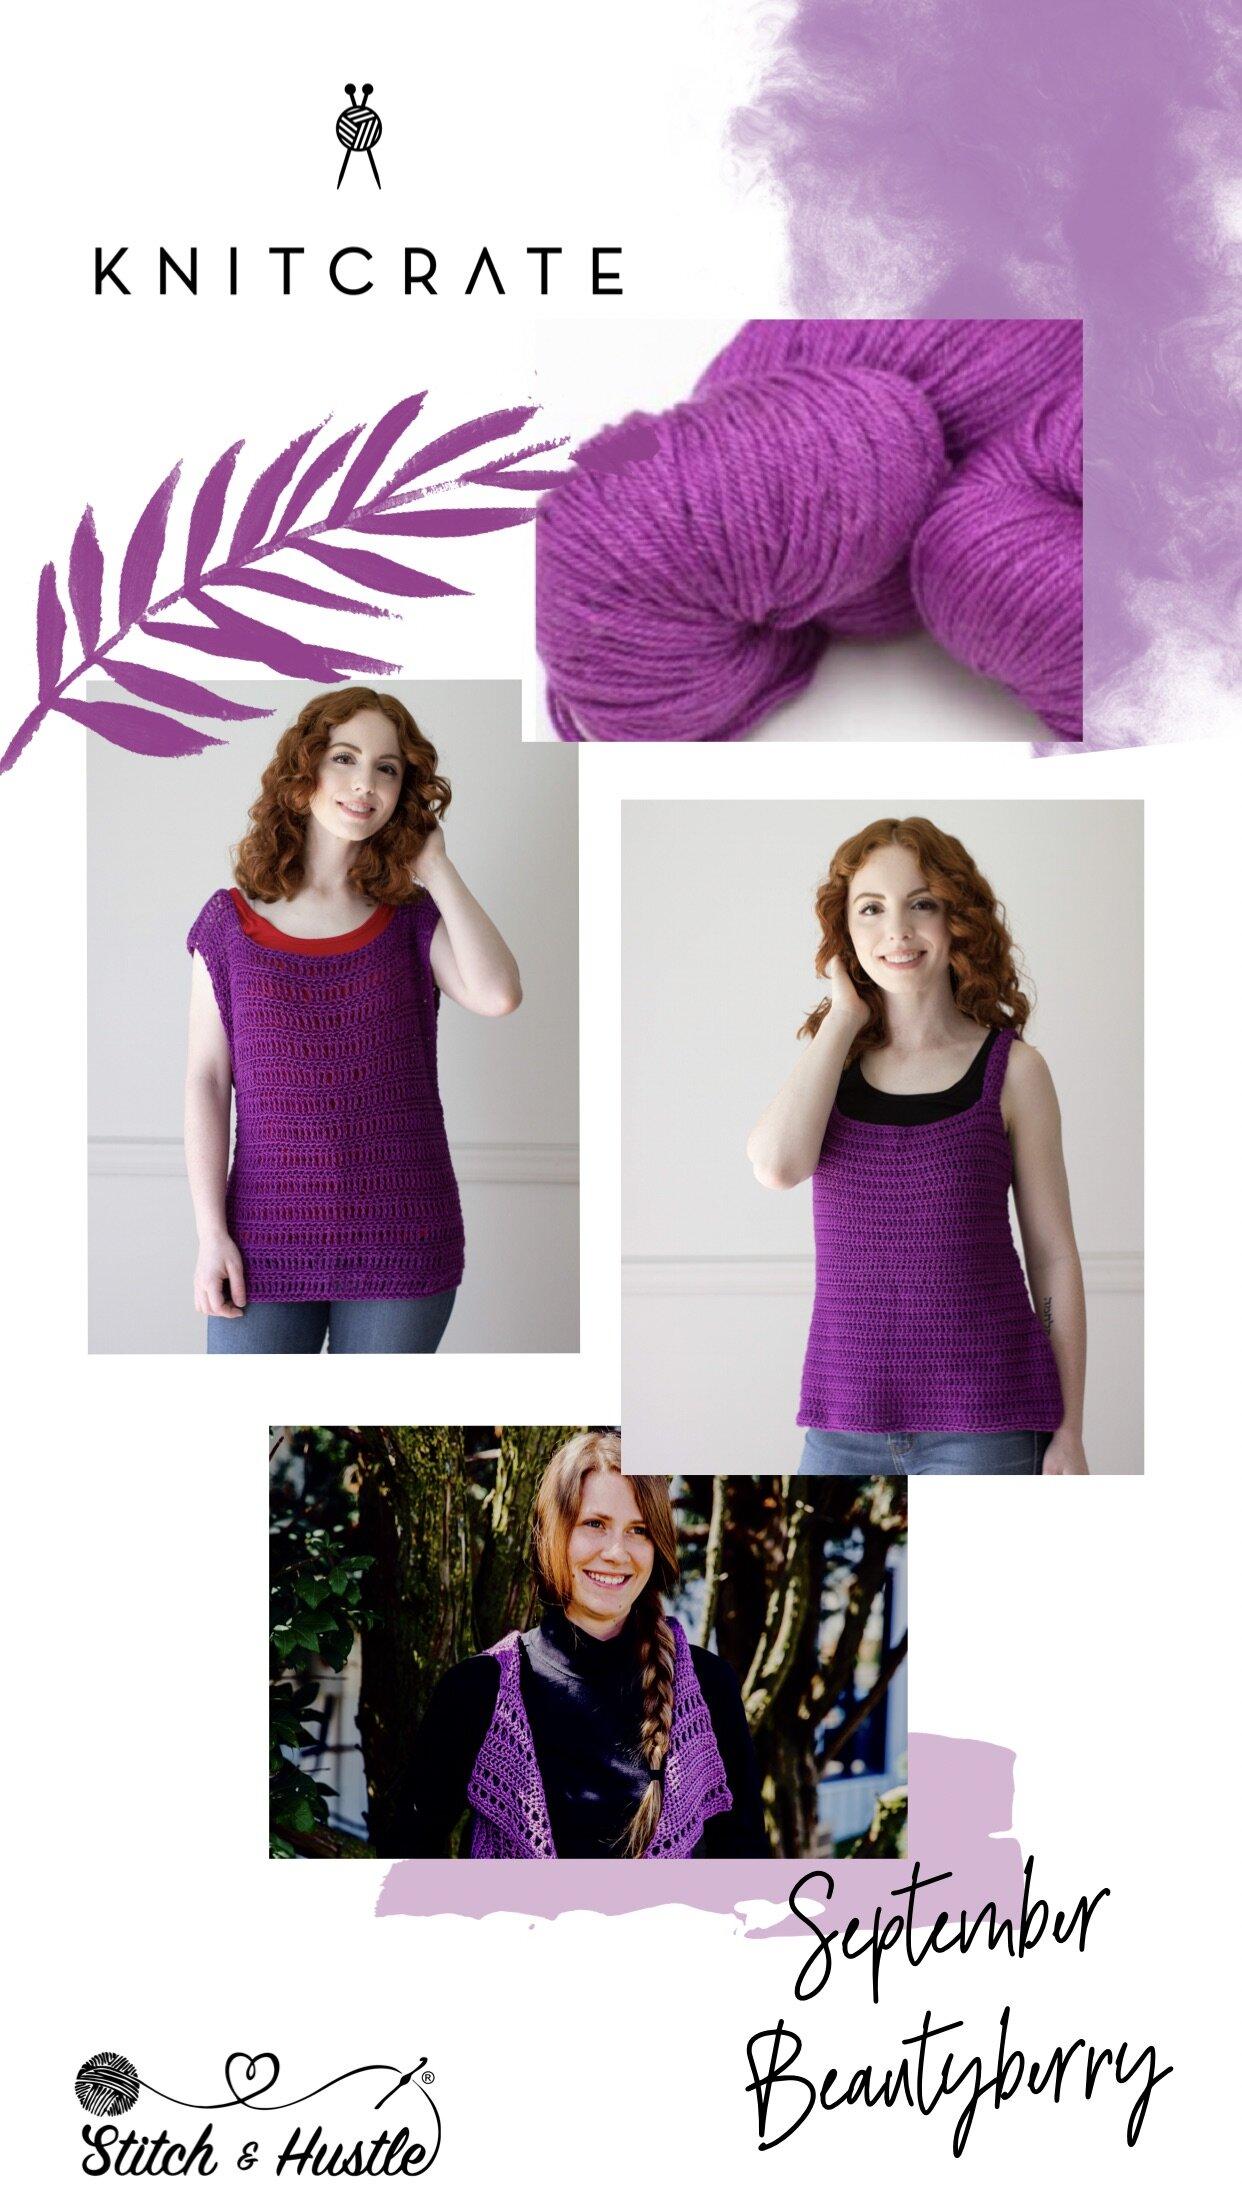 knitcrate-crochet-patterns.jpg